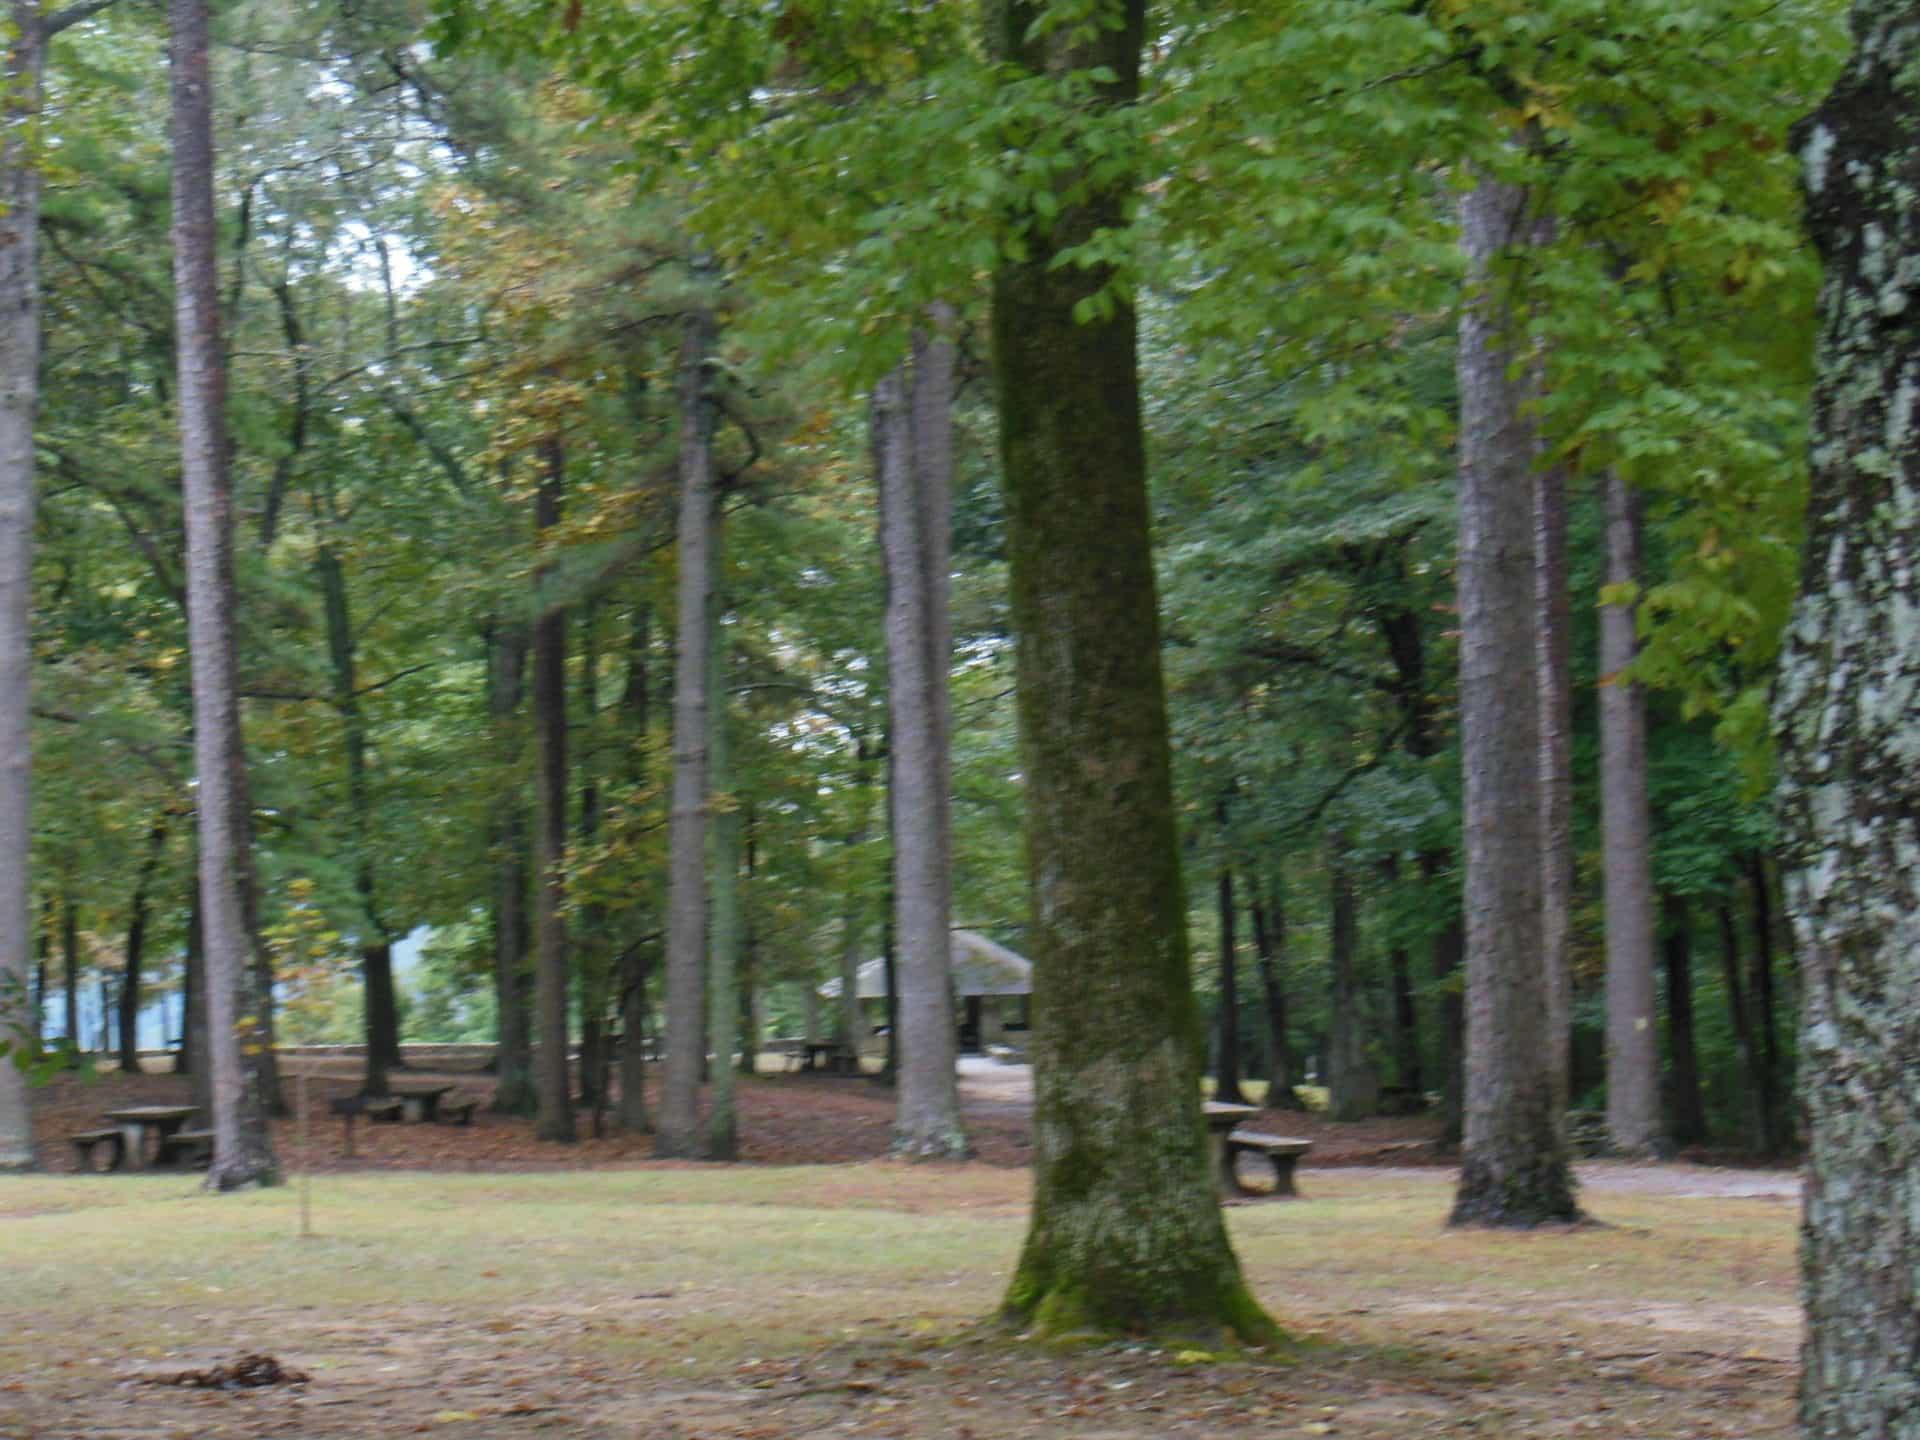 Monte Sano State Park - Trees